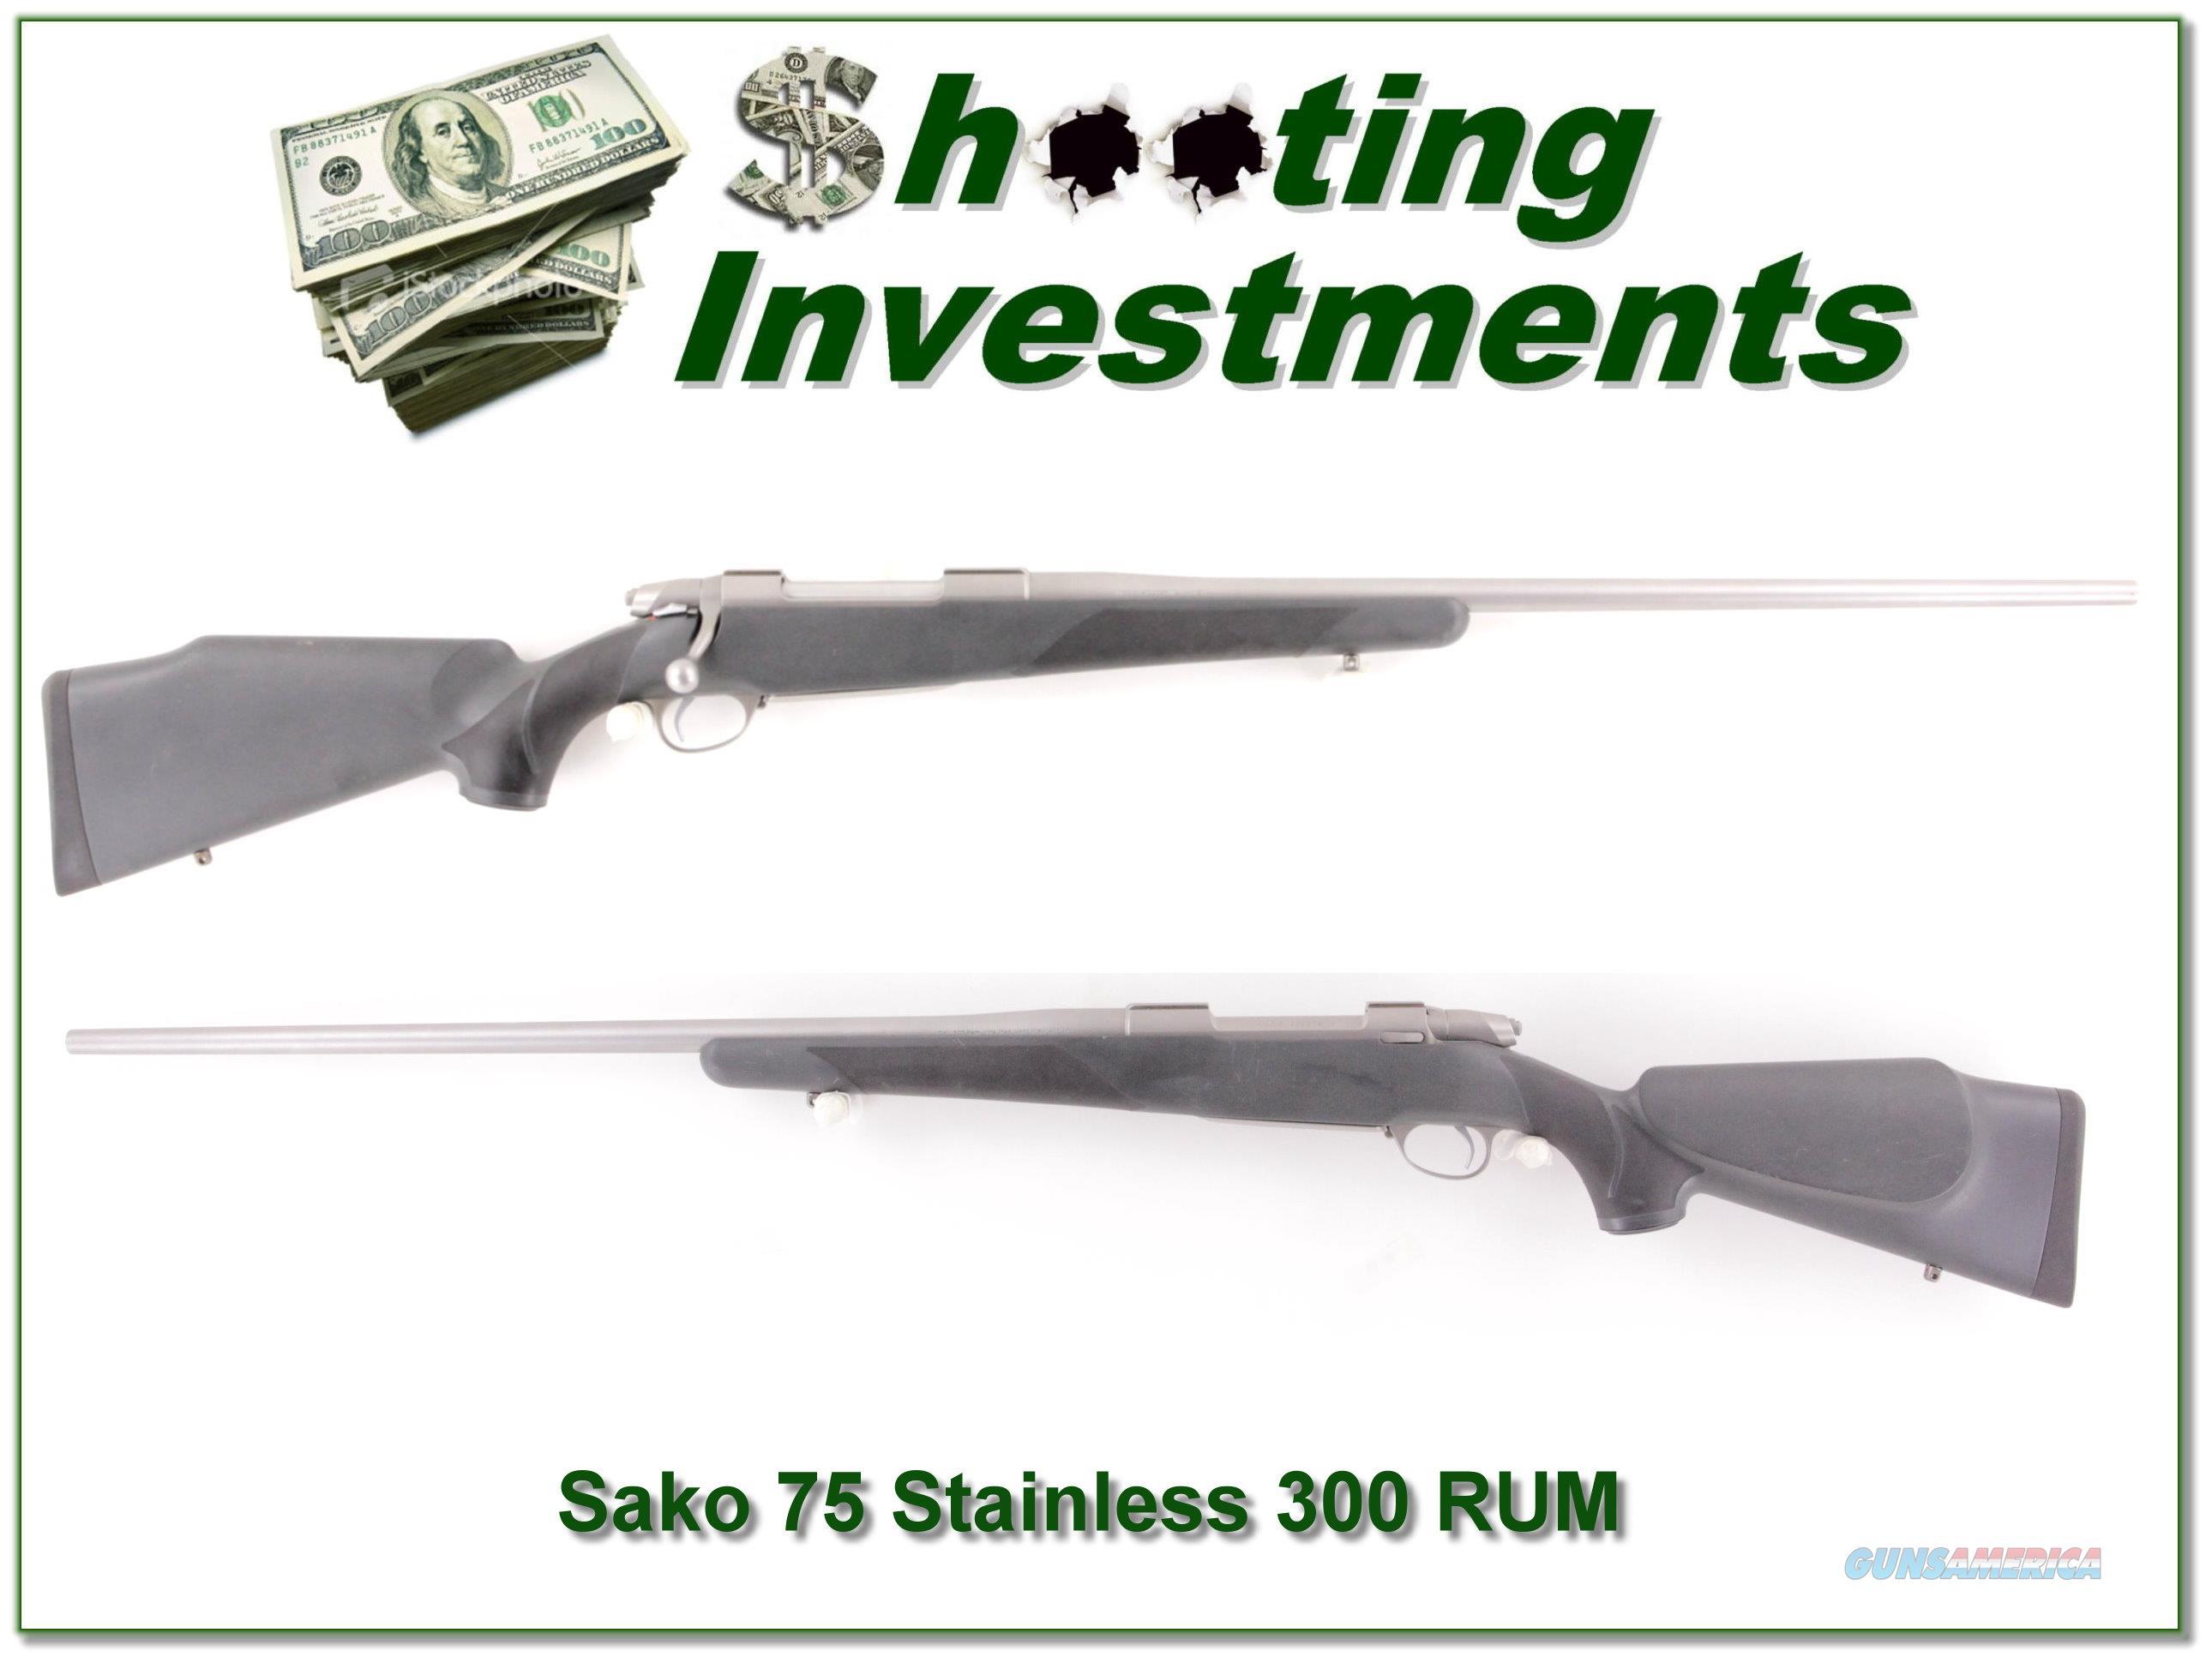 Sako 75 All-Weather Stainless 300 RUM RARE!  Guns > Rifles > Sako Rifles > M75 Series